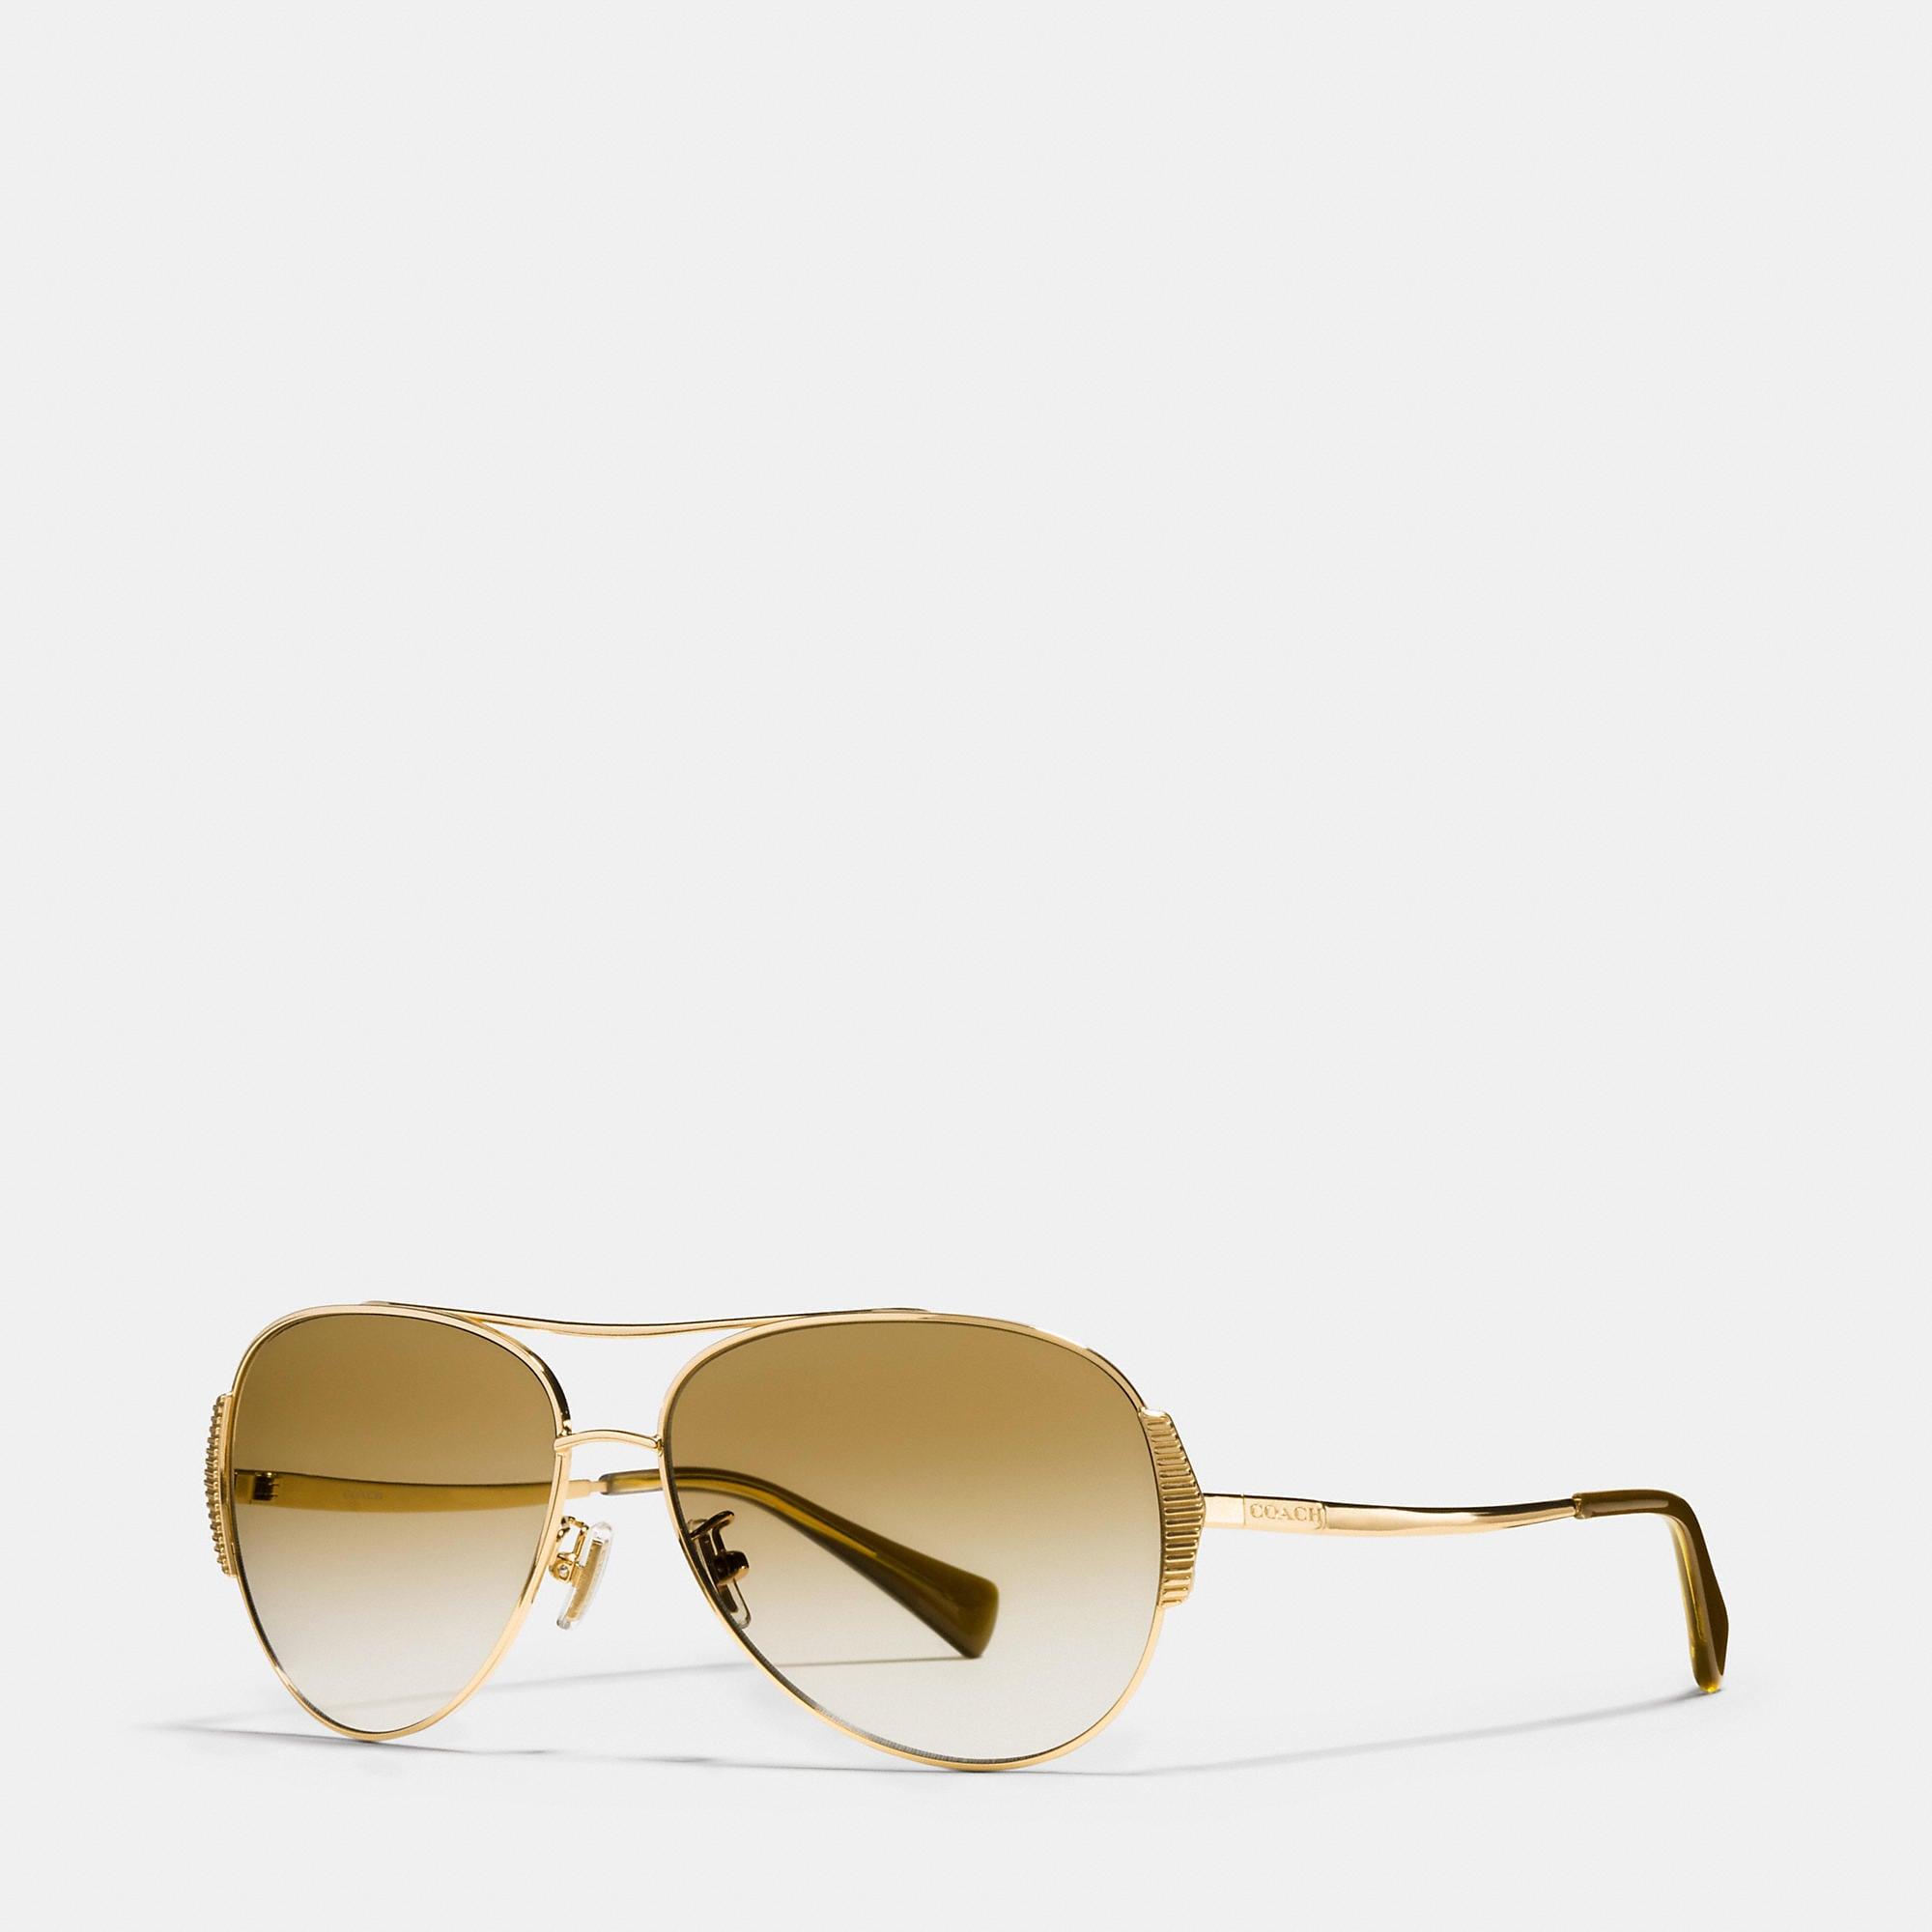 Coach Idol Pilot Sunglasses